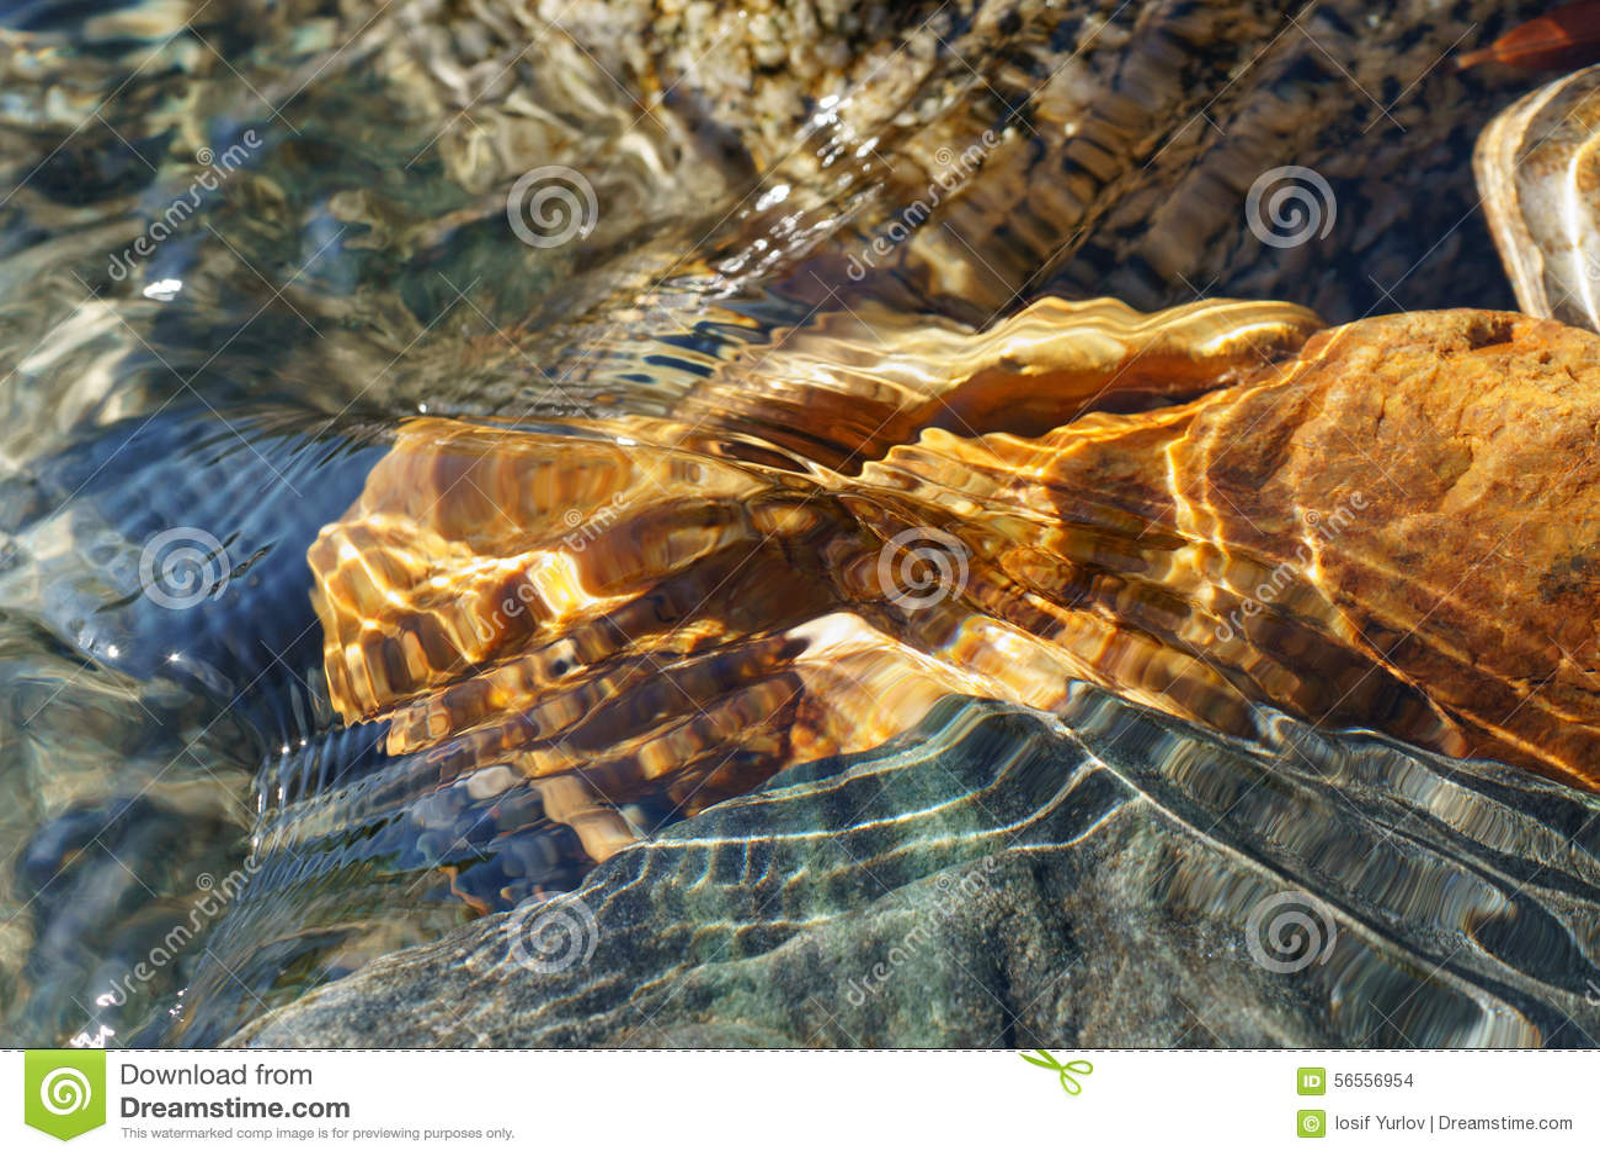 Download Κρύσταλλο - καθαρίστε το νερό του μικρού ρυακιού στη στέπα Altai Στοκ Εικόνες - εικόνα από φρέσκος, τοπίο: 56556954